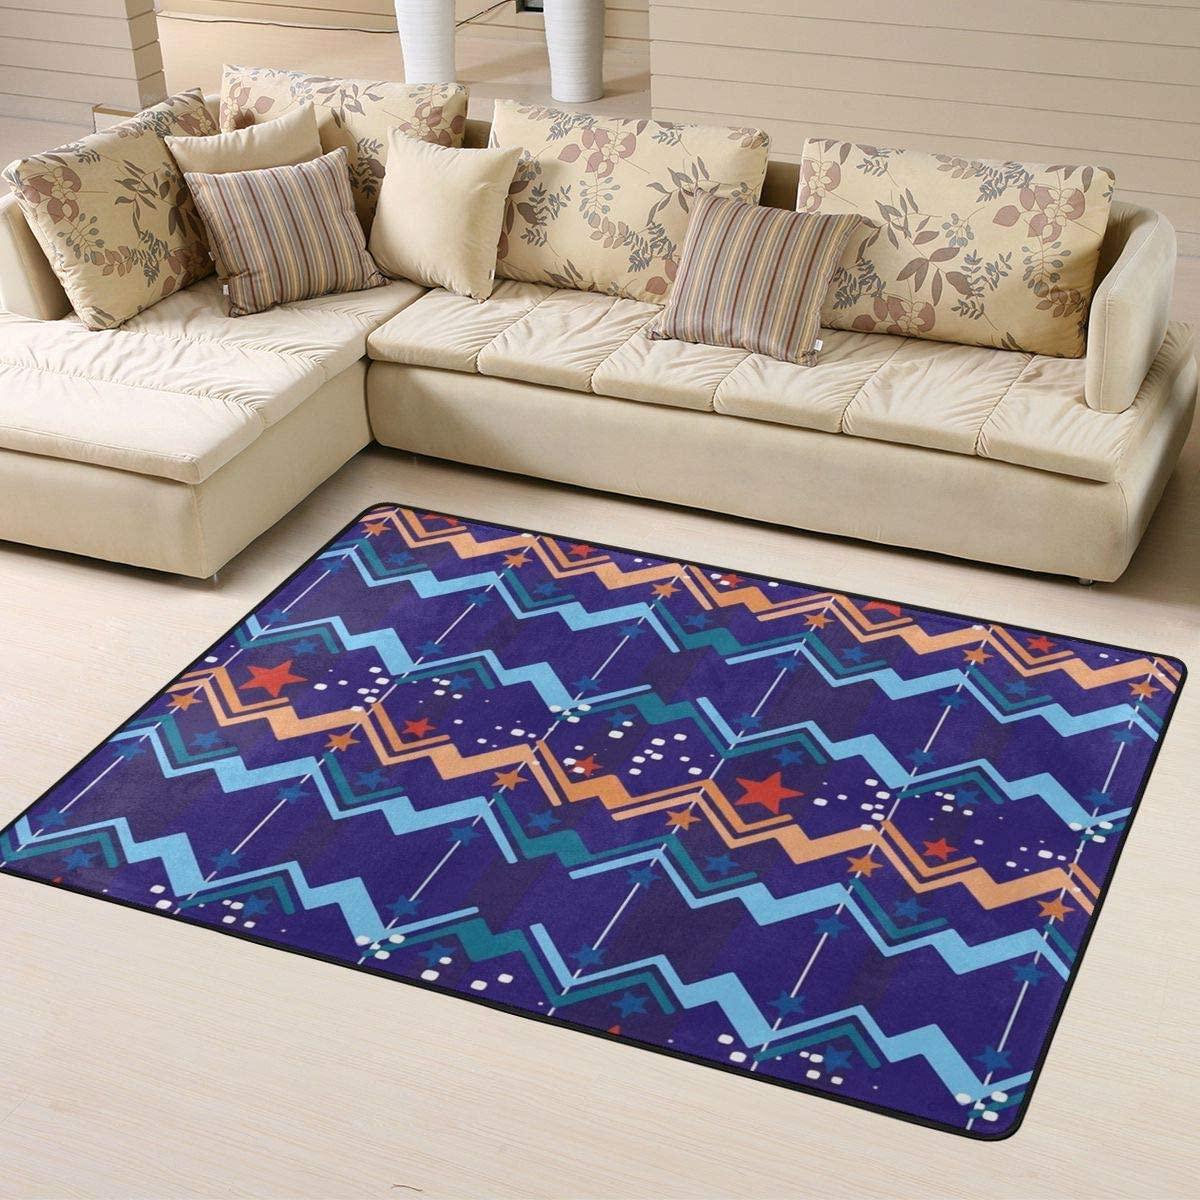 Area Rug Stars and Stripes Carpets Floor Front Door Mat Doormats for Kids Room Boys Room Home Decorative